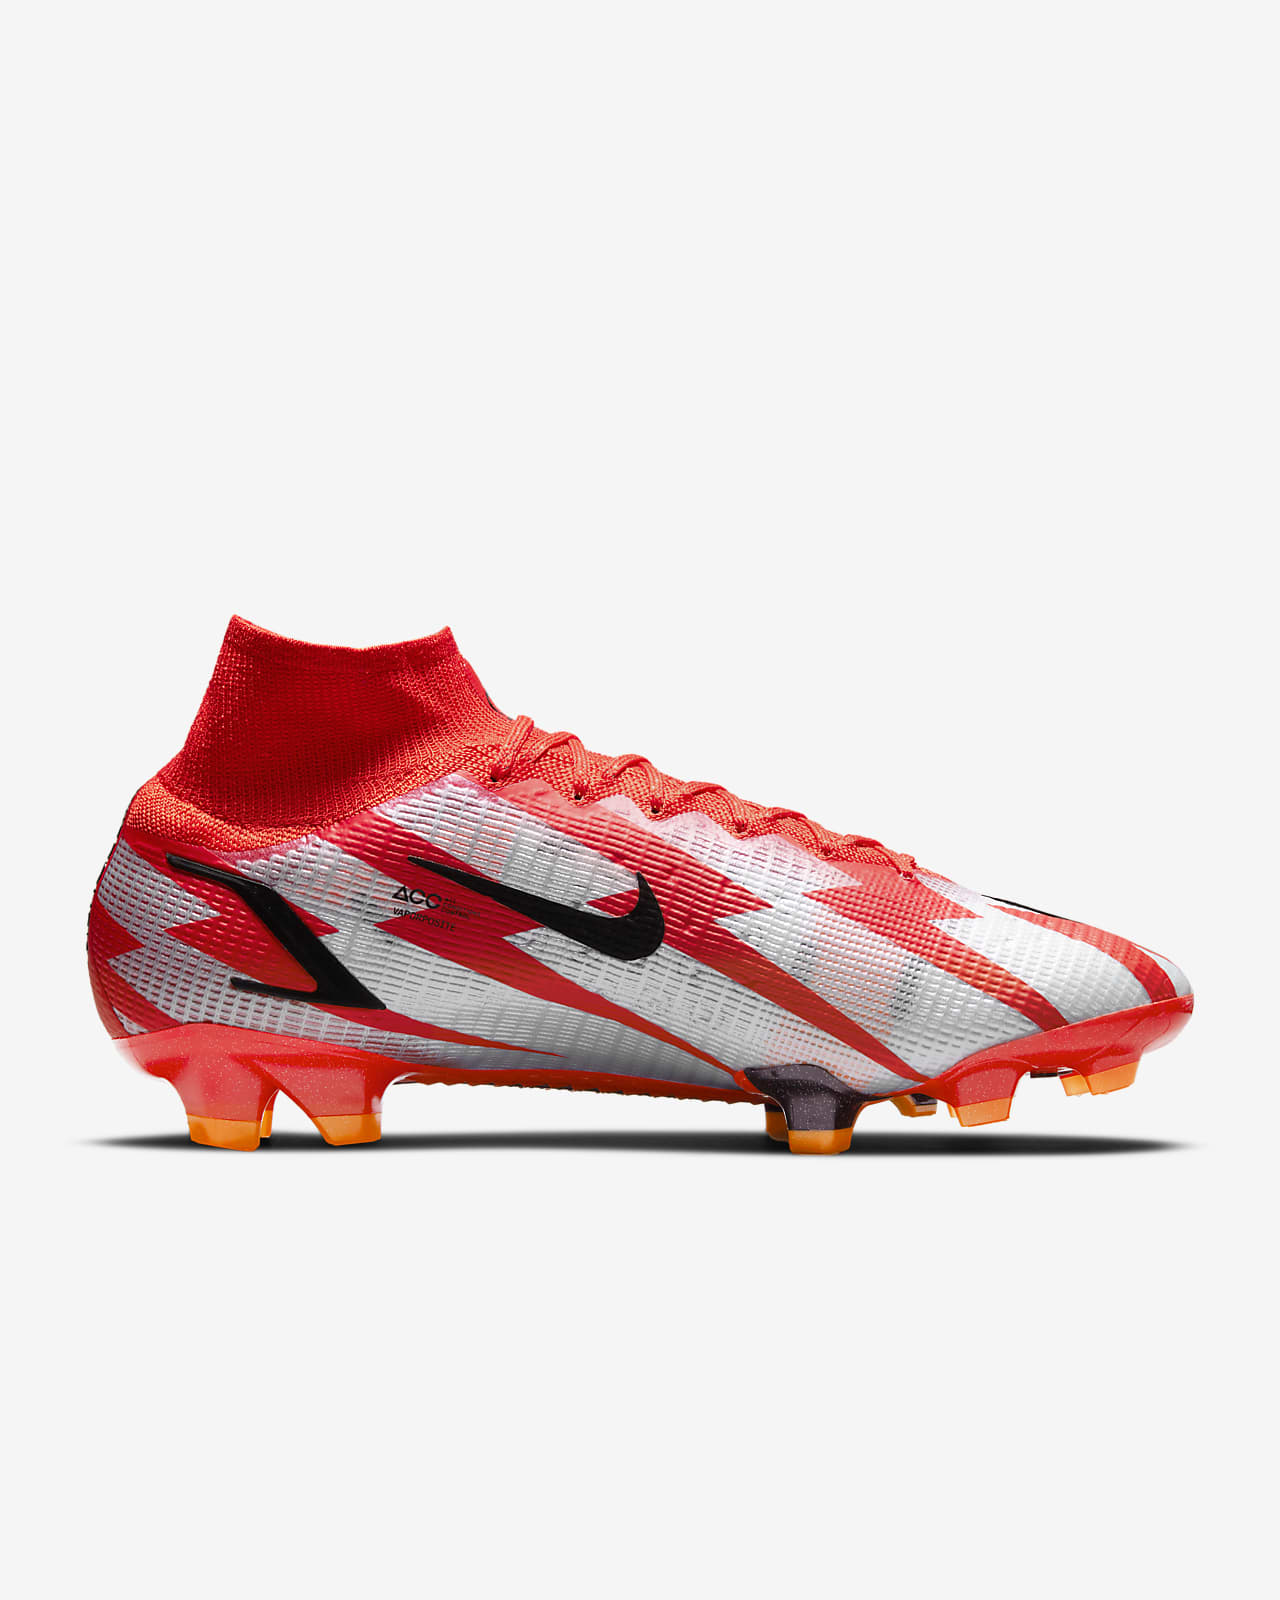 Nike Mercurial Superfly 8 Elite CR7 FG Fußballschuh für normalen Rasen.  Nike DE